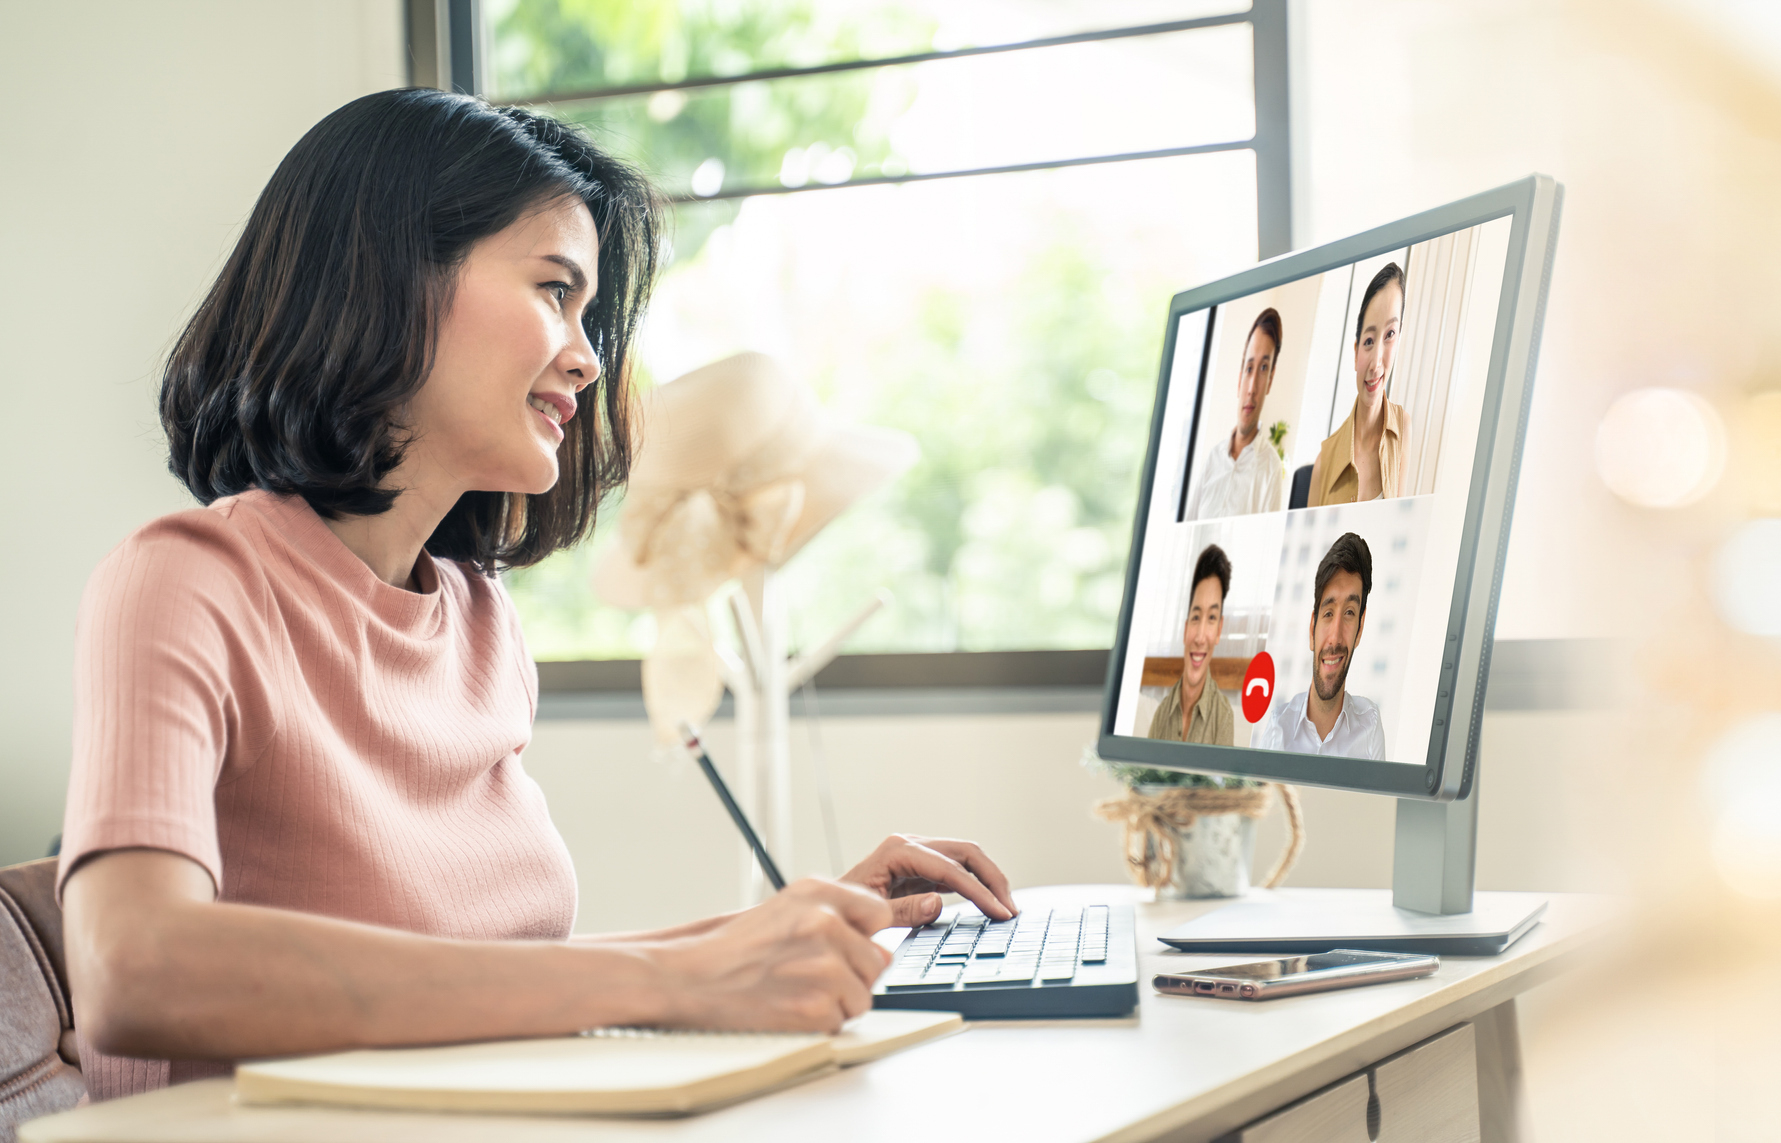 Woman Taking a Virtual Class